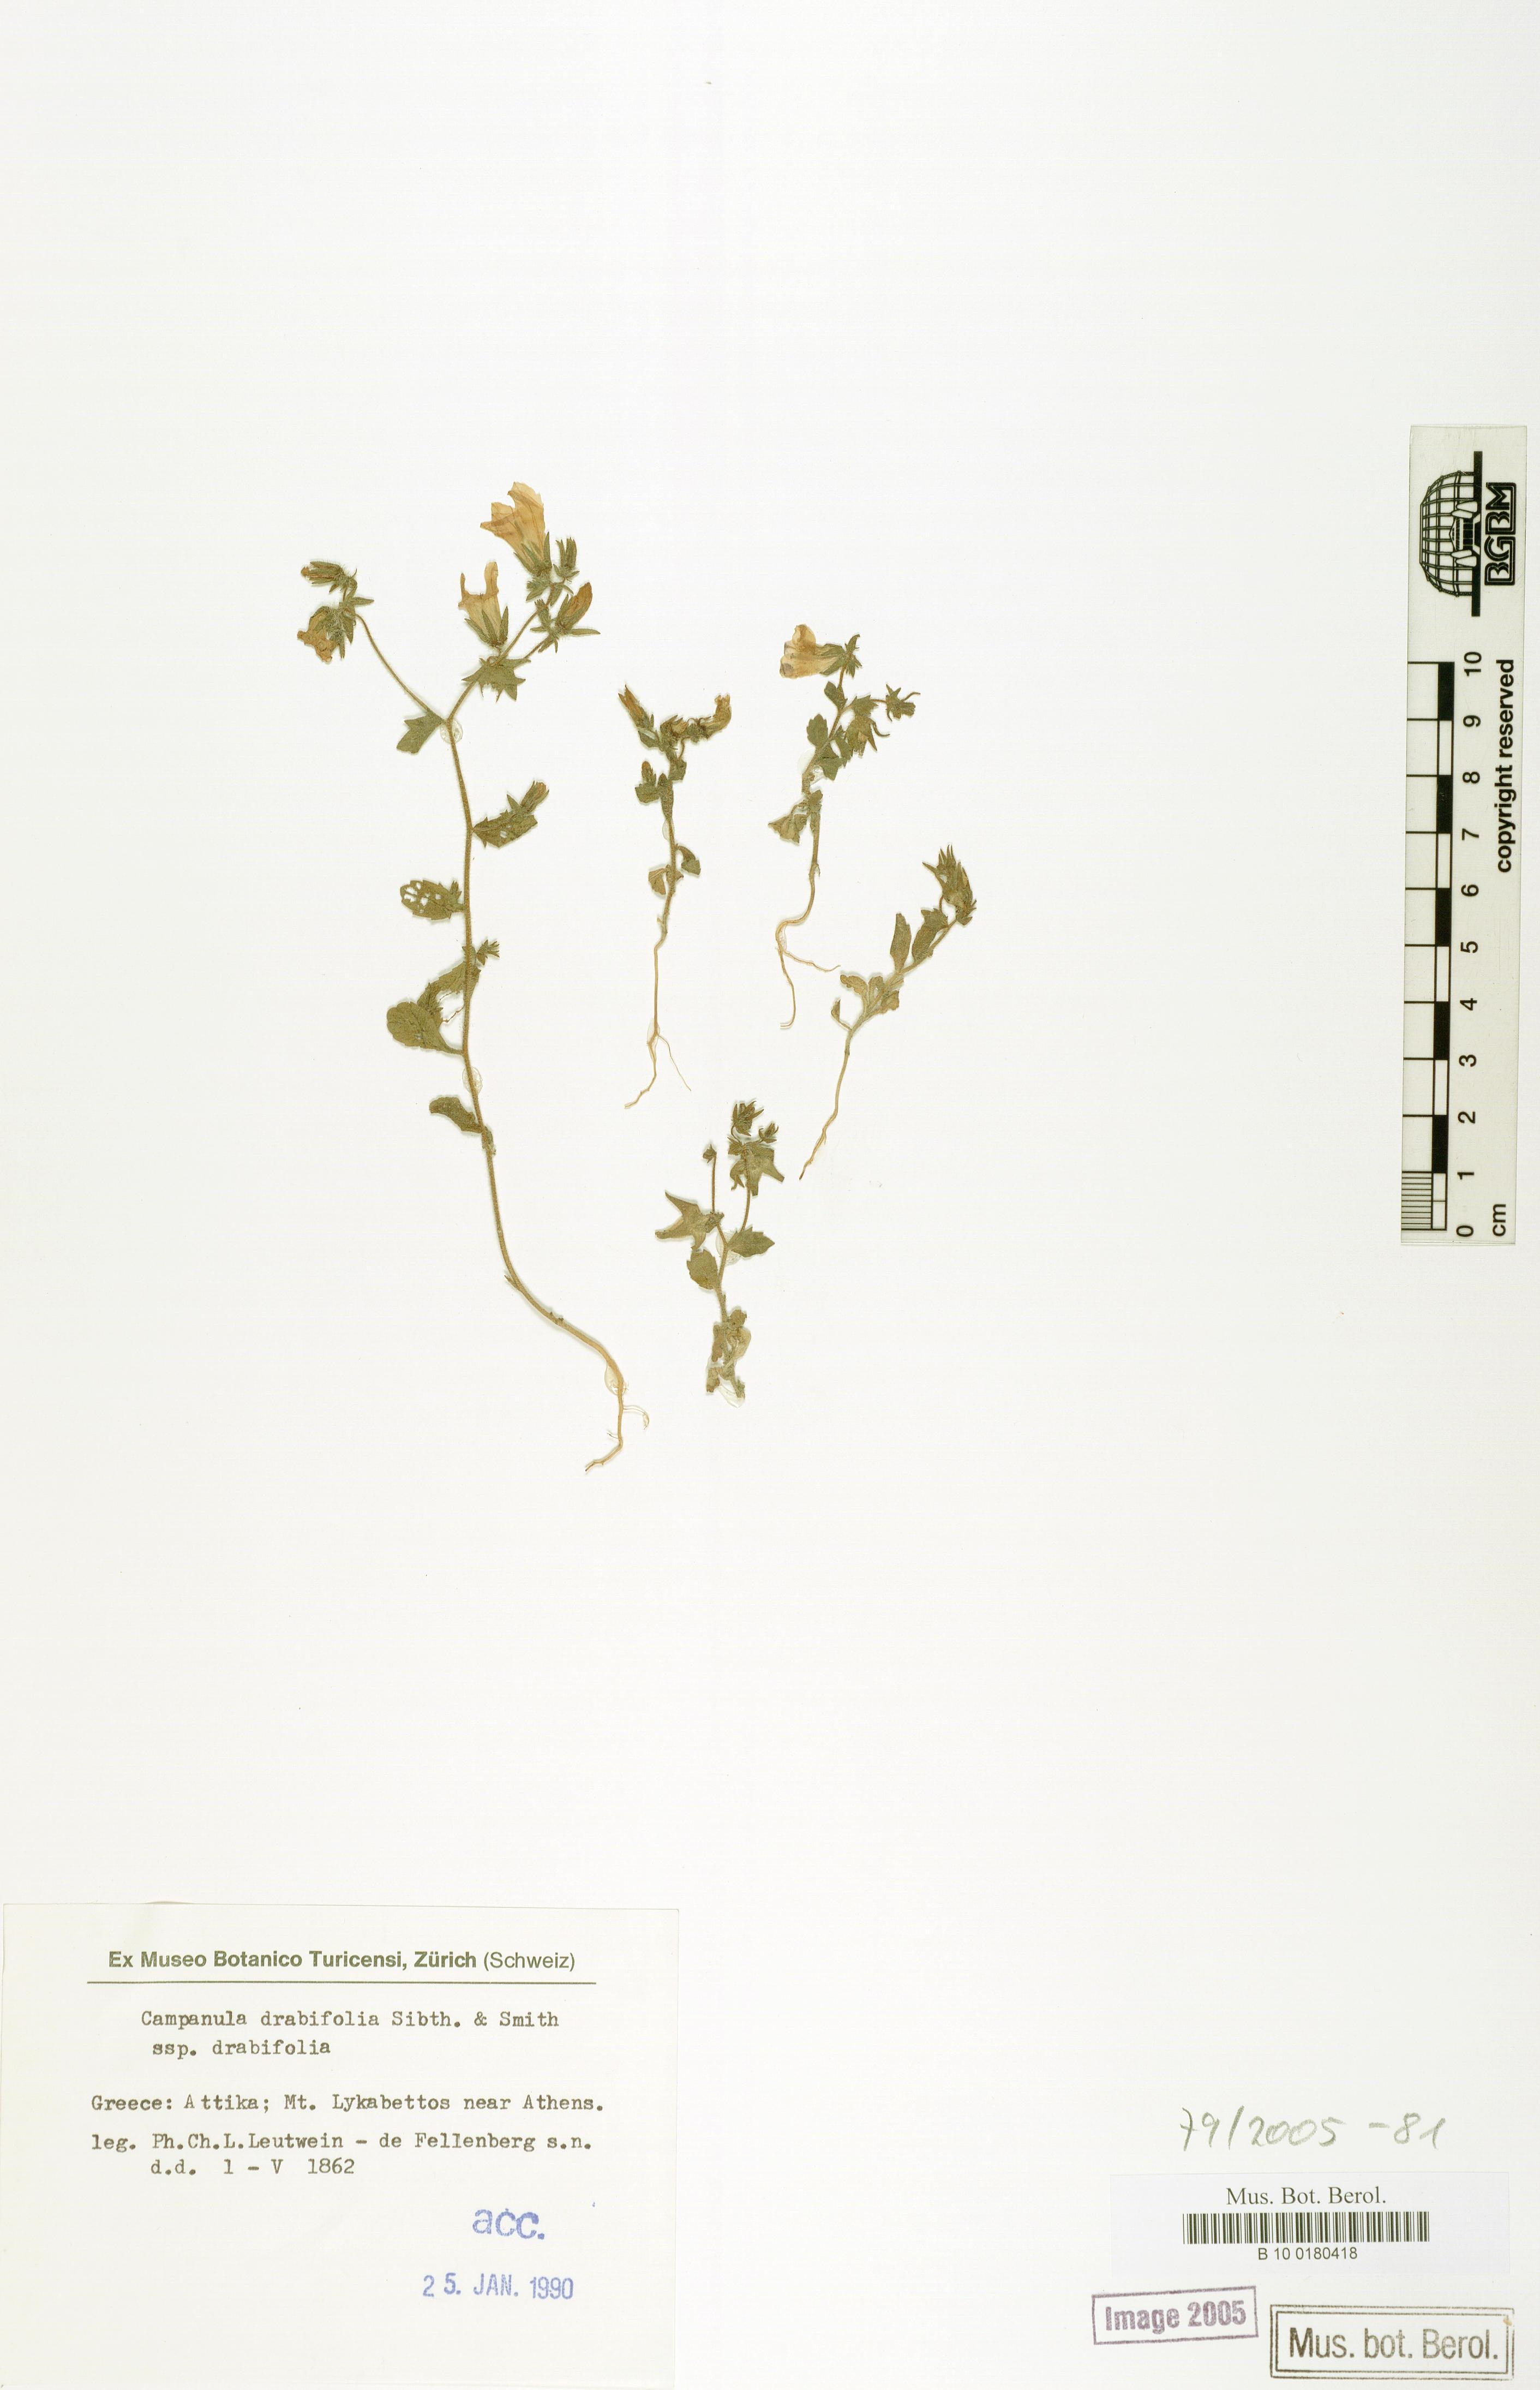 http://ww2.bgbm.org/herbarium/images/B/10/01/80/41/B_10_0180418.jpg